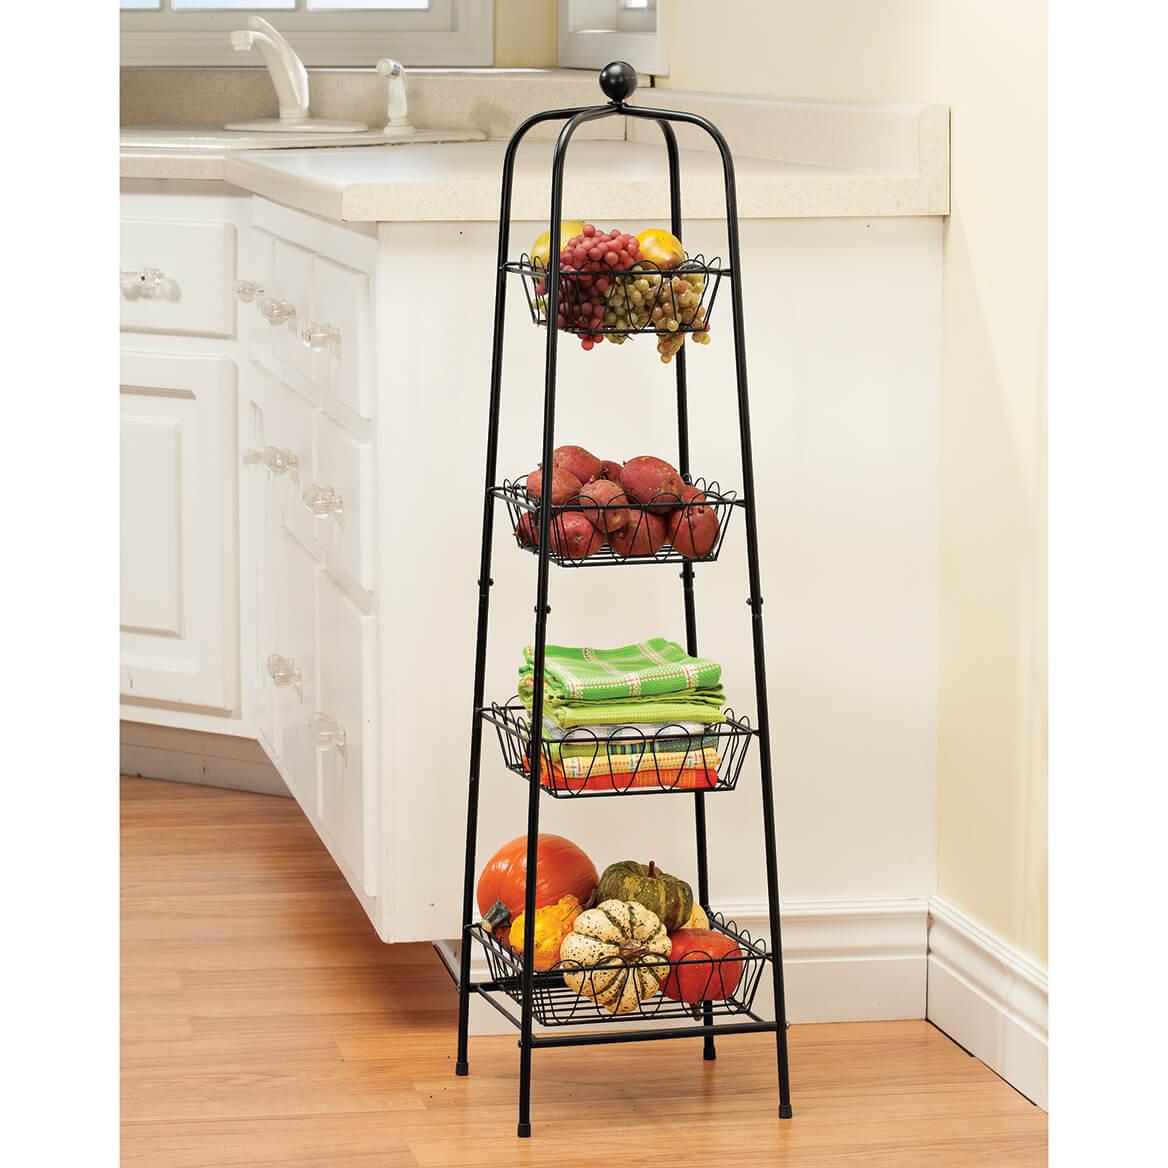 4 tier metal basket tower storage stand storage baskets miles kimball. Black Bedroom Furniture Sets. Home Design Ideas